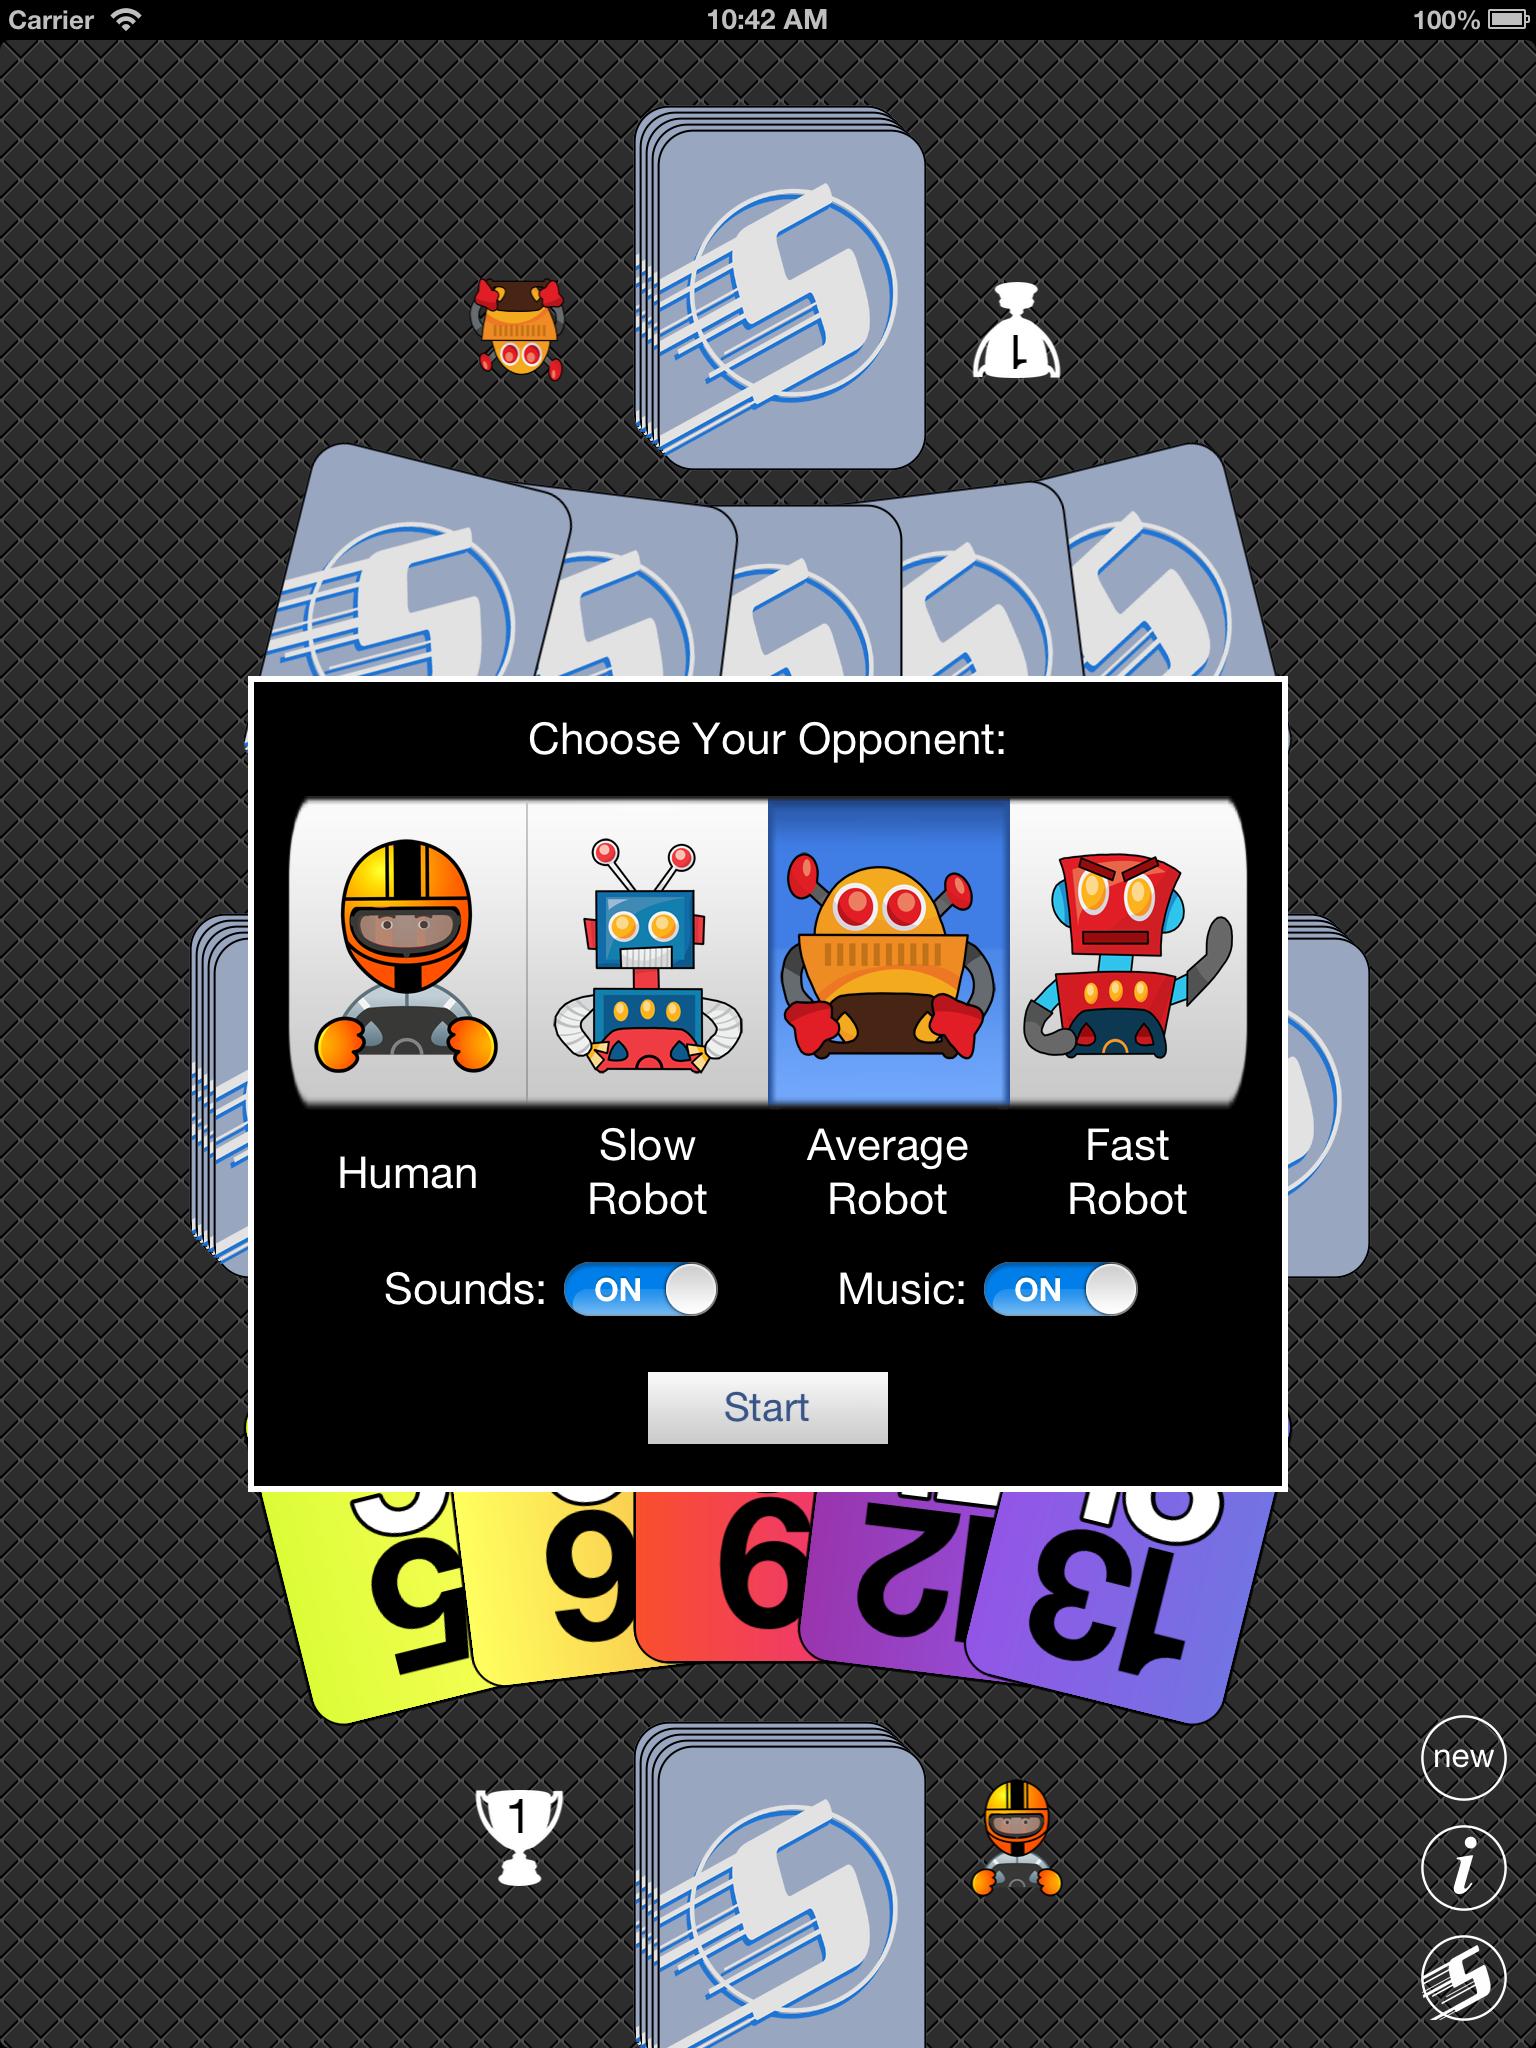 iOS Simulator Screen shot Aug 6, 2013 10.42.26 AM.png